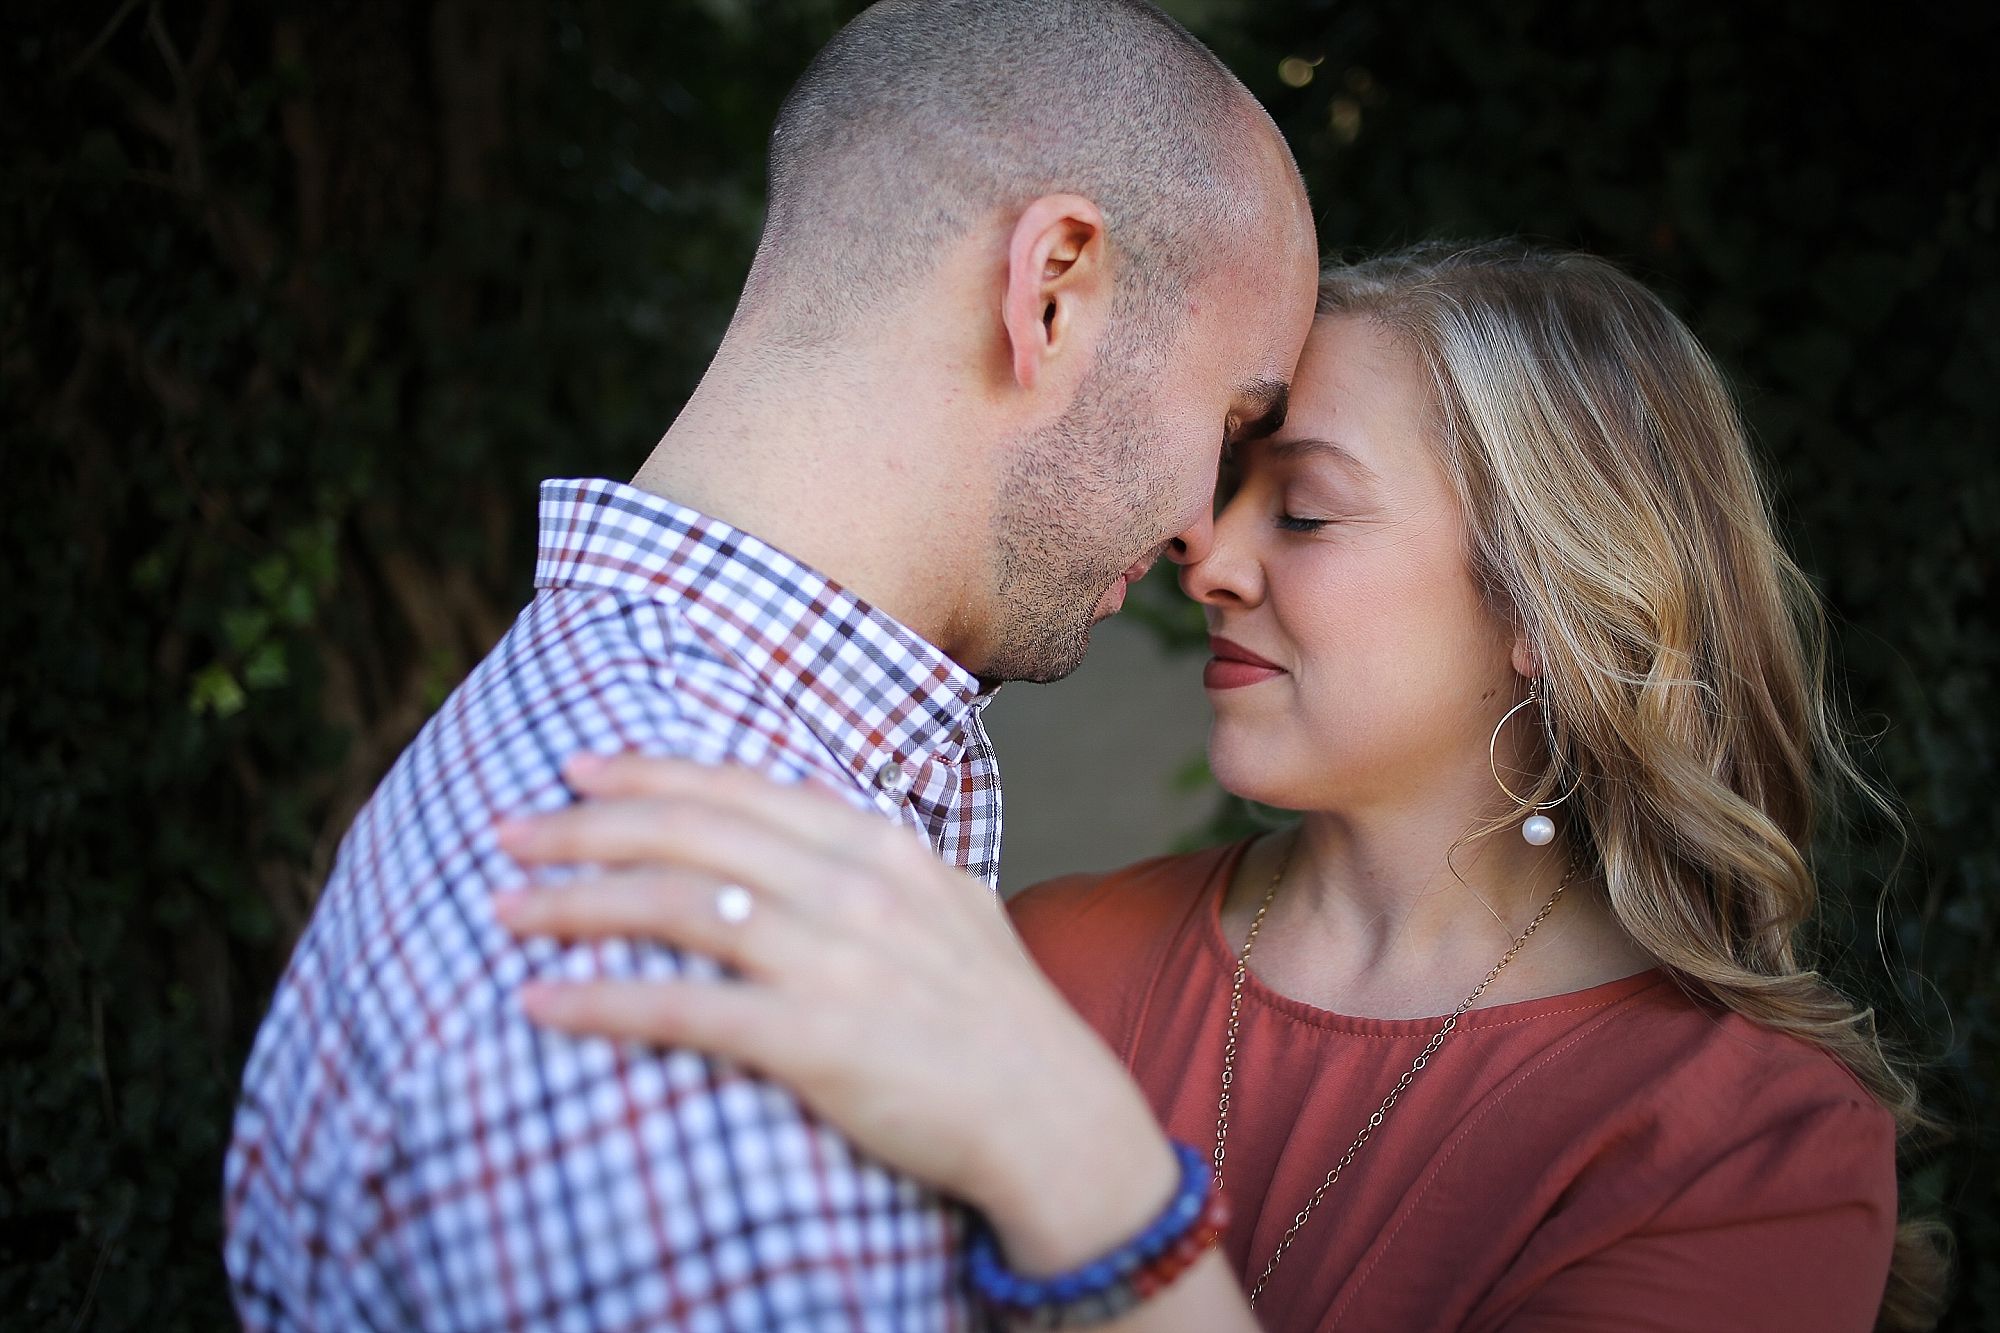 Blacksburg, Virginia Engagement Photos | Virginia Tech Wedding Photographer Holly Cromer